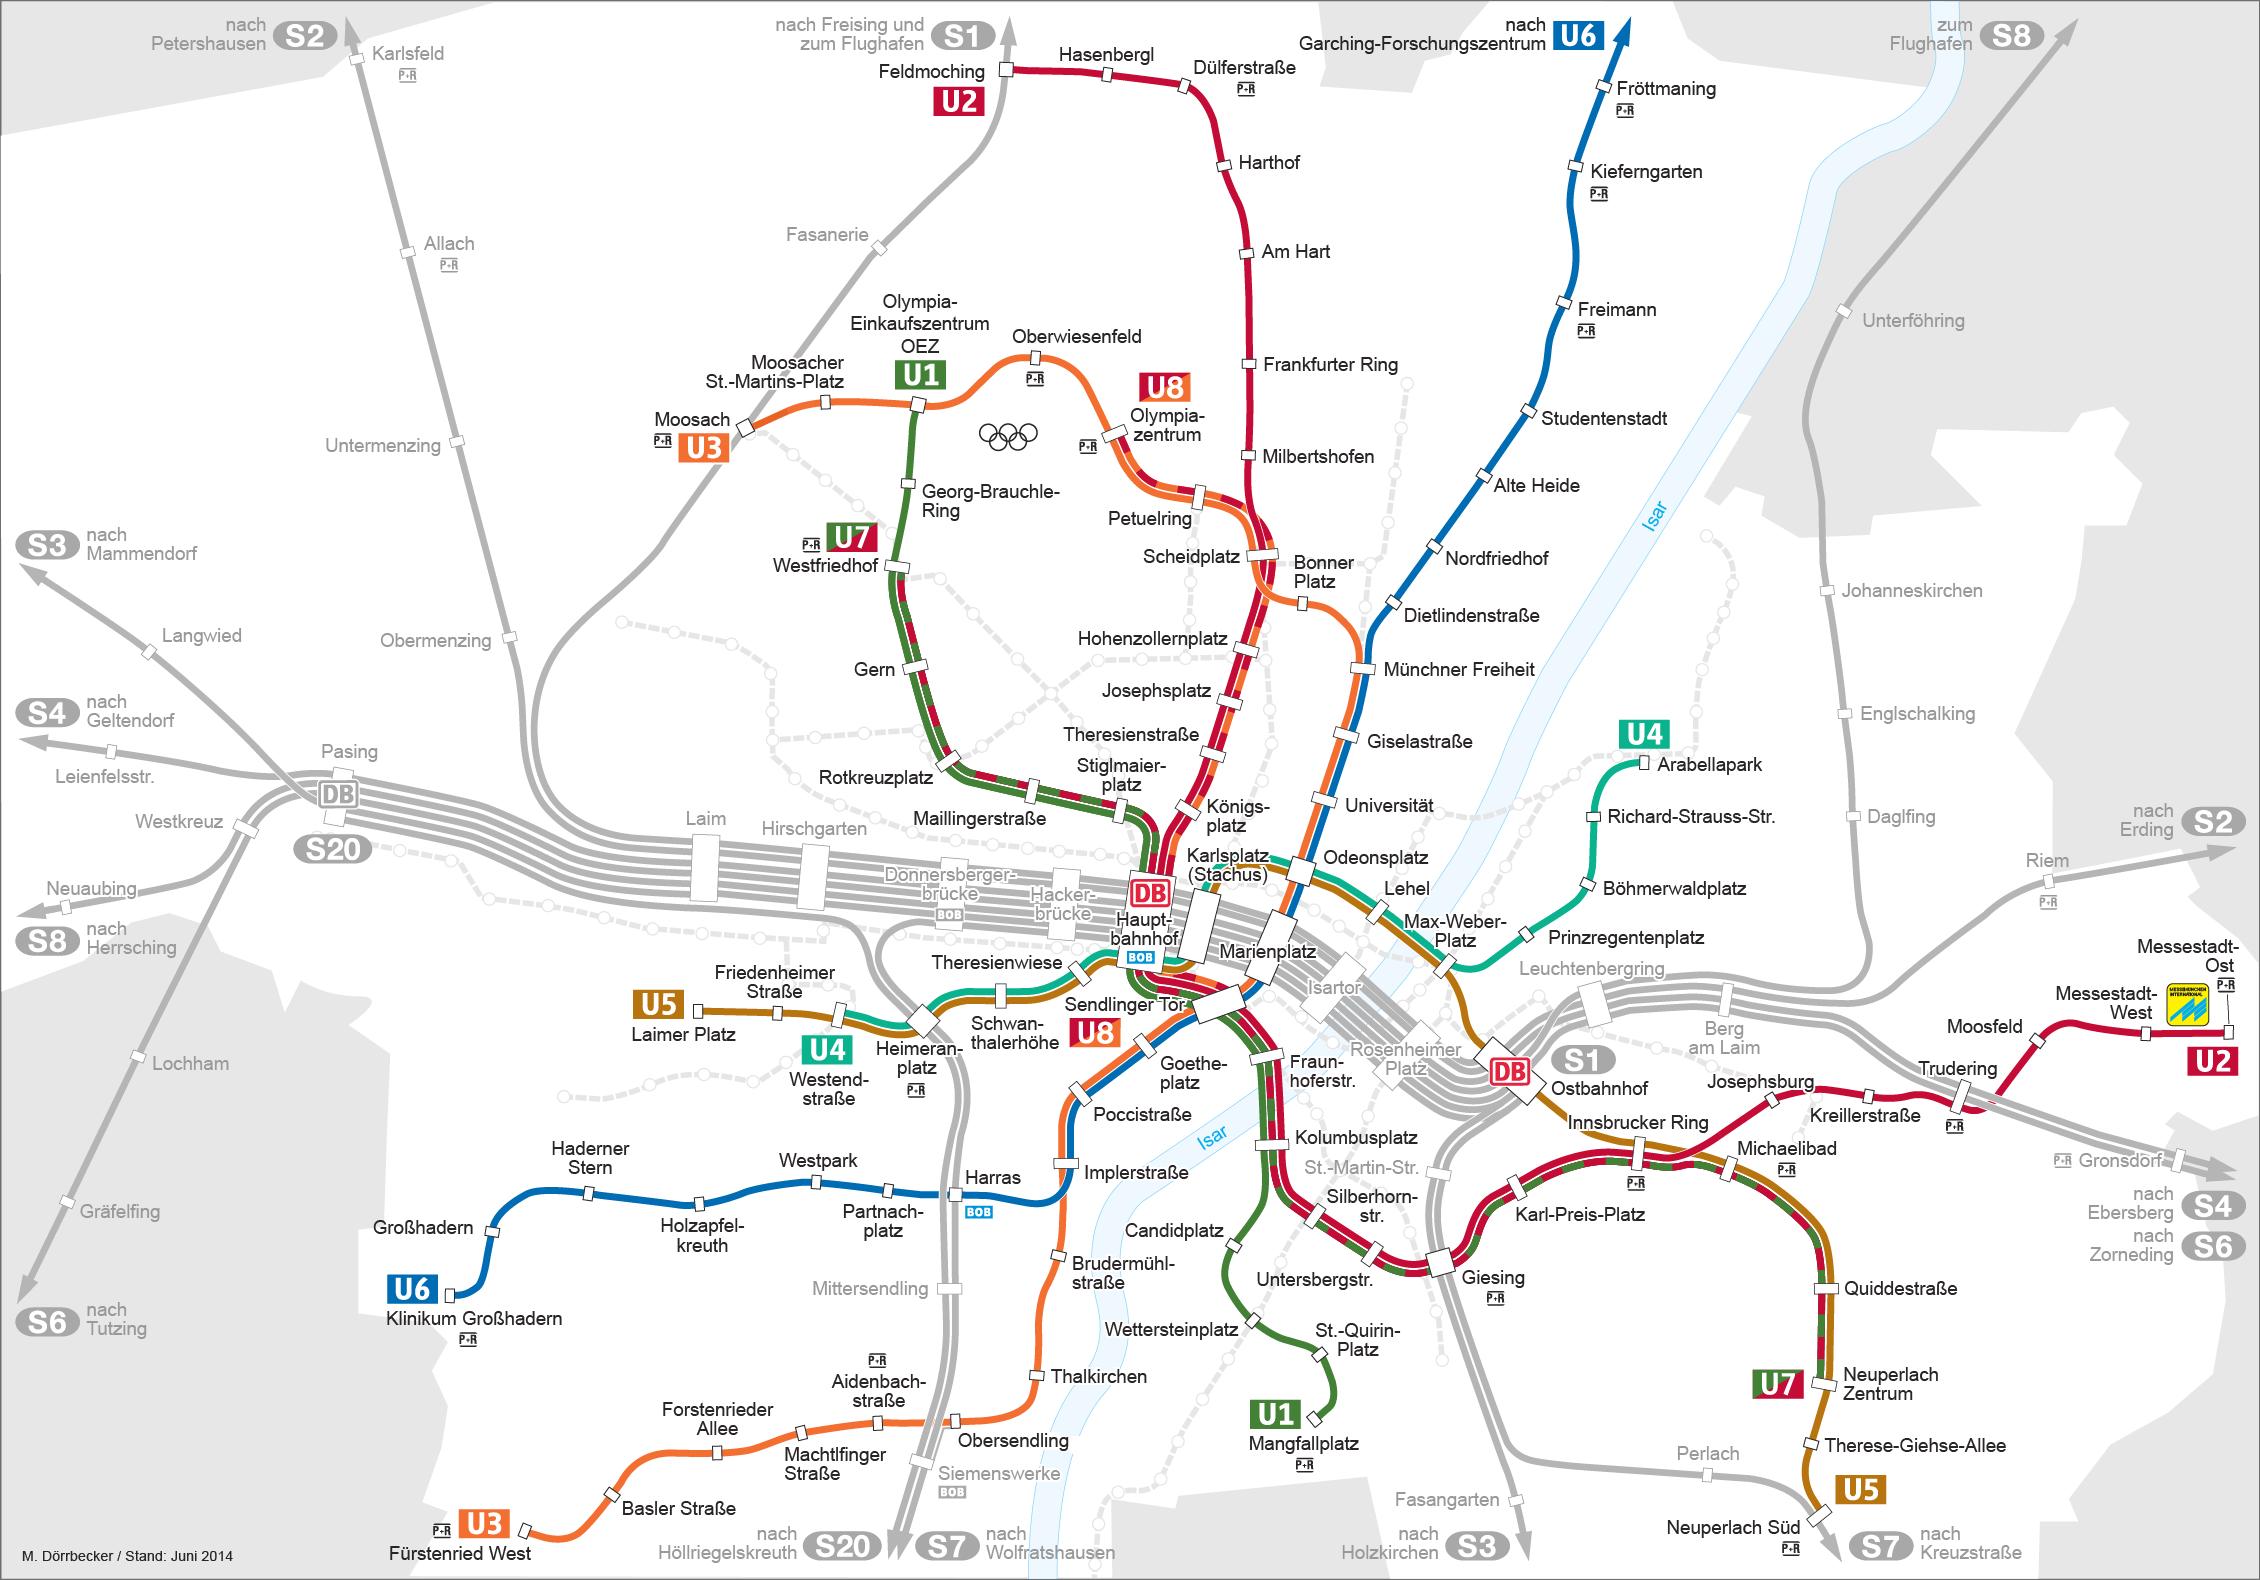 Munich U-Bahn | German U-Bahn Wiki | FANDOM powered by Wikia